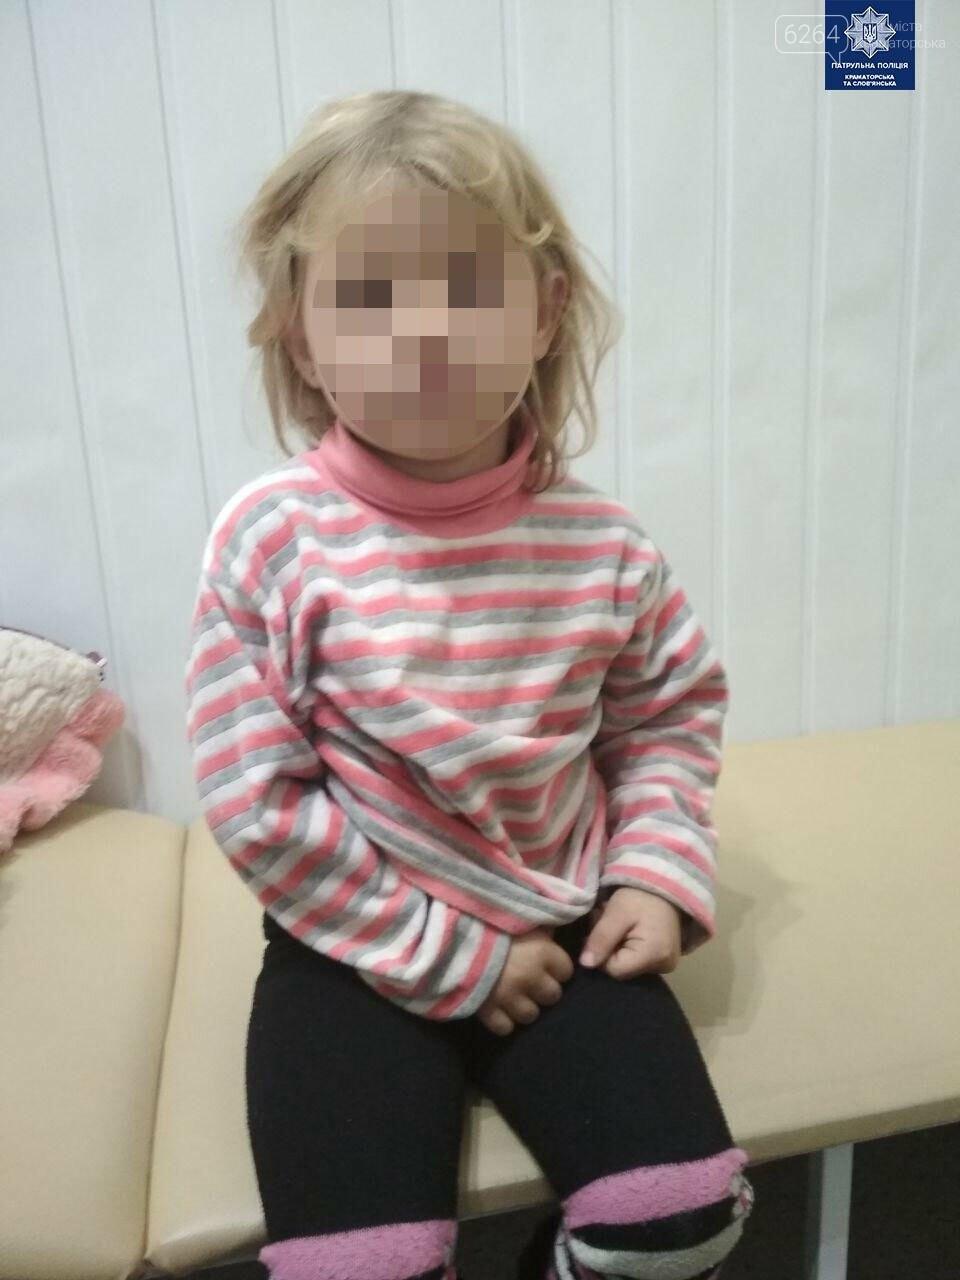 В Краматорске пьяная женщина забыла ребенка в такси, фото-1